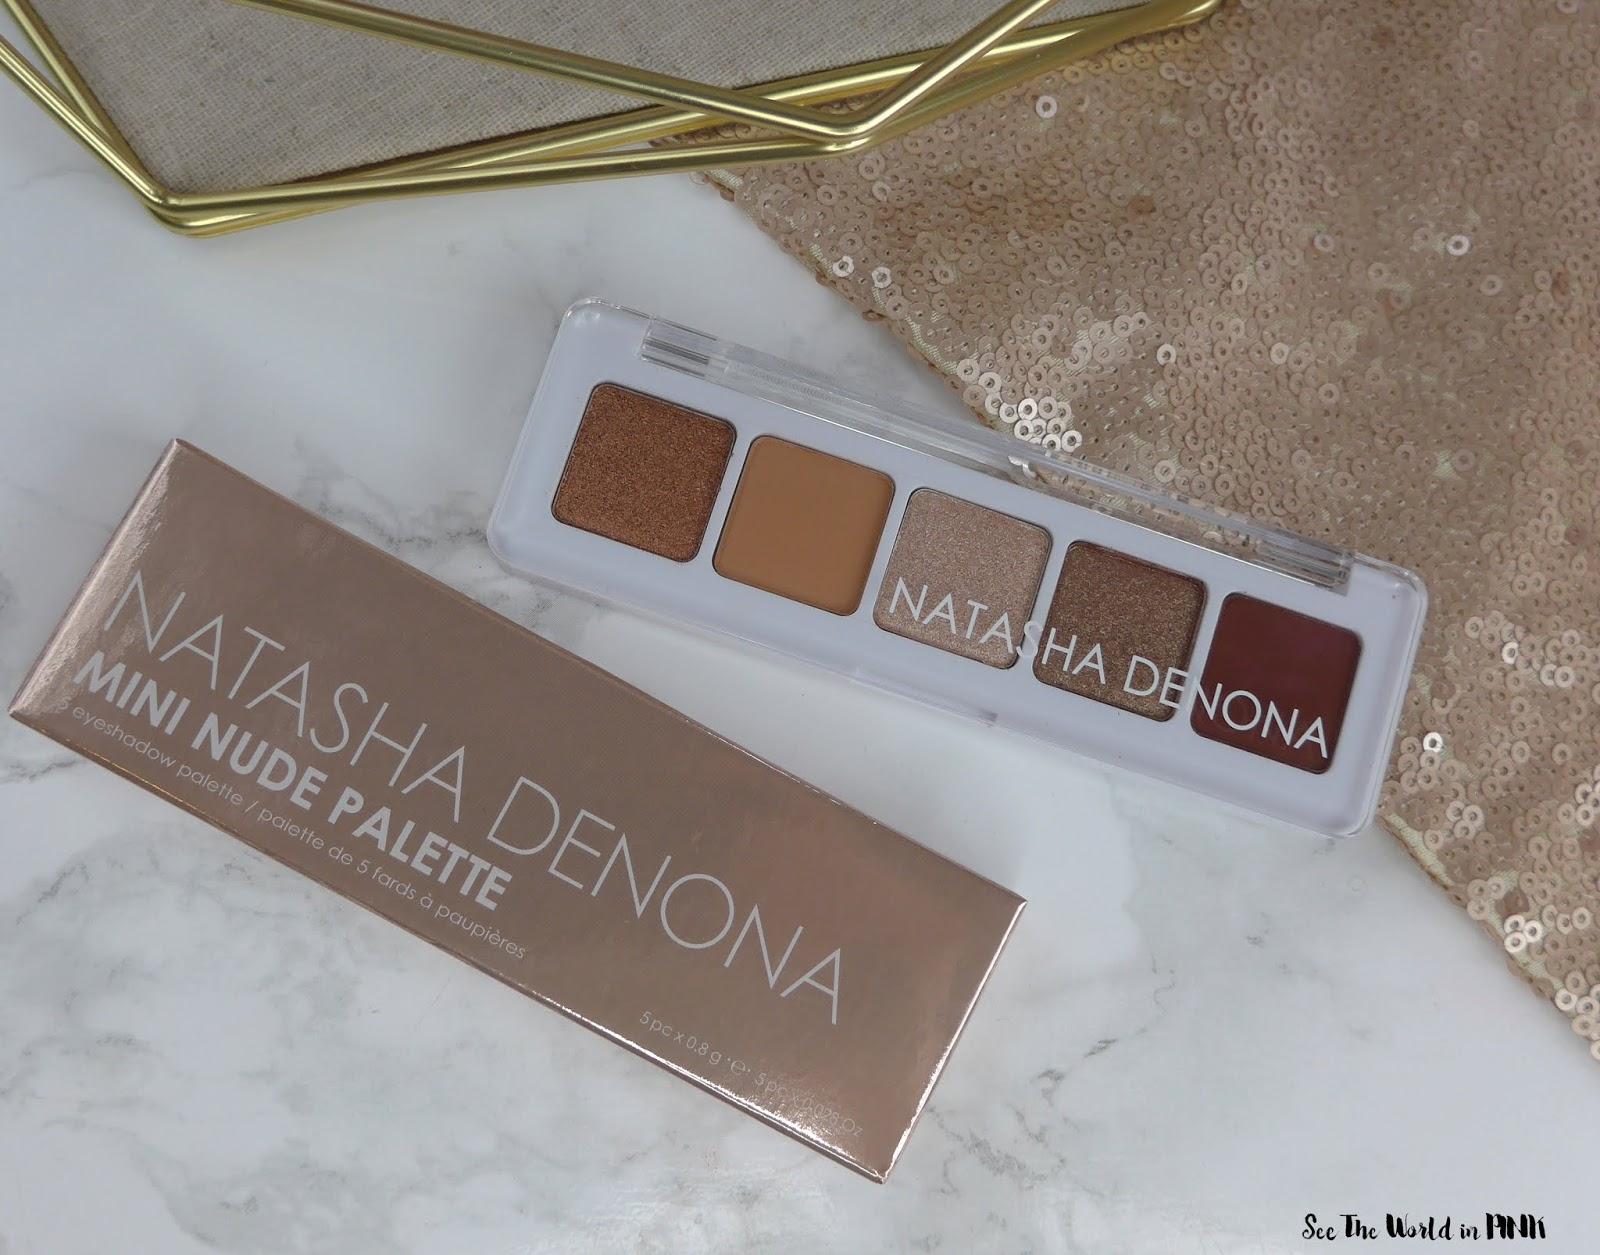 Natasha Denona Mini Nude Eyeshadow Palette - Swatches, Review and Look!